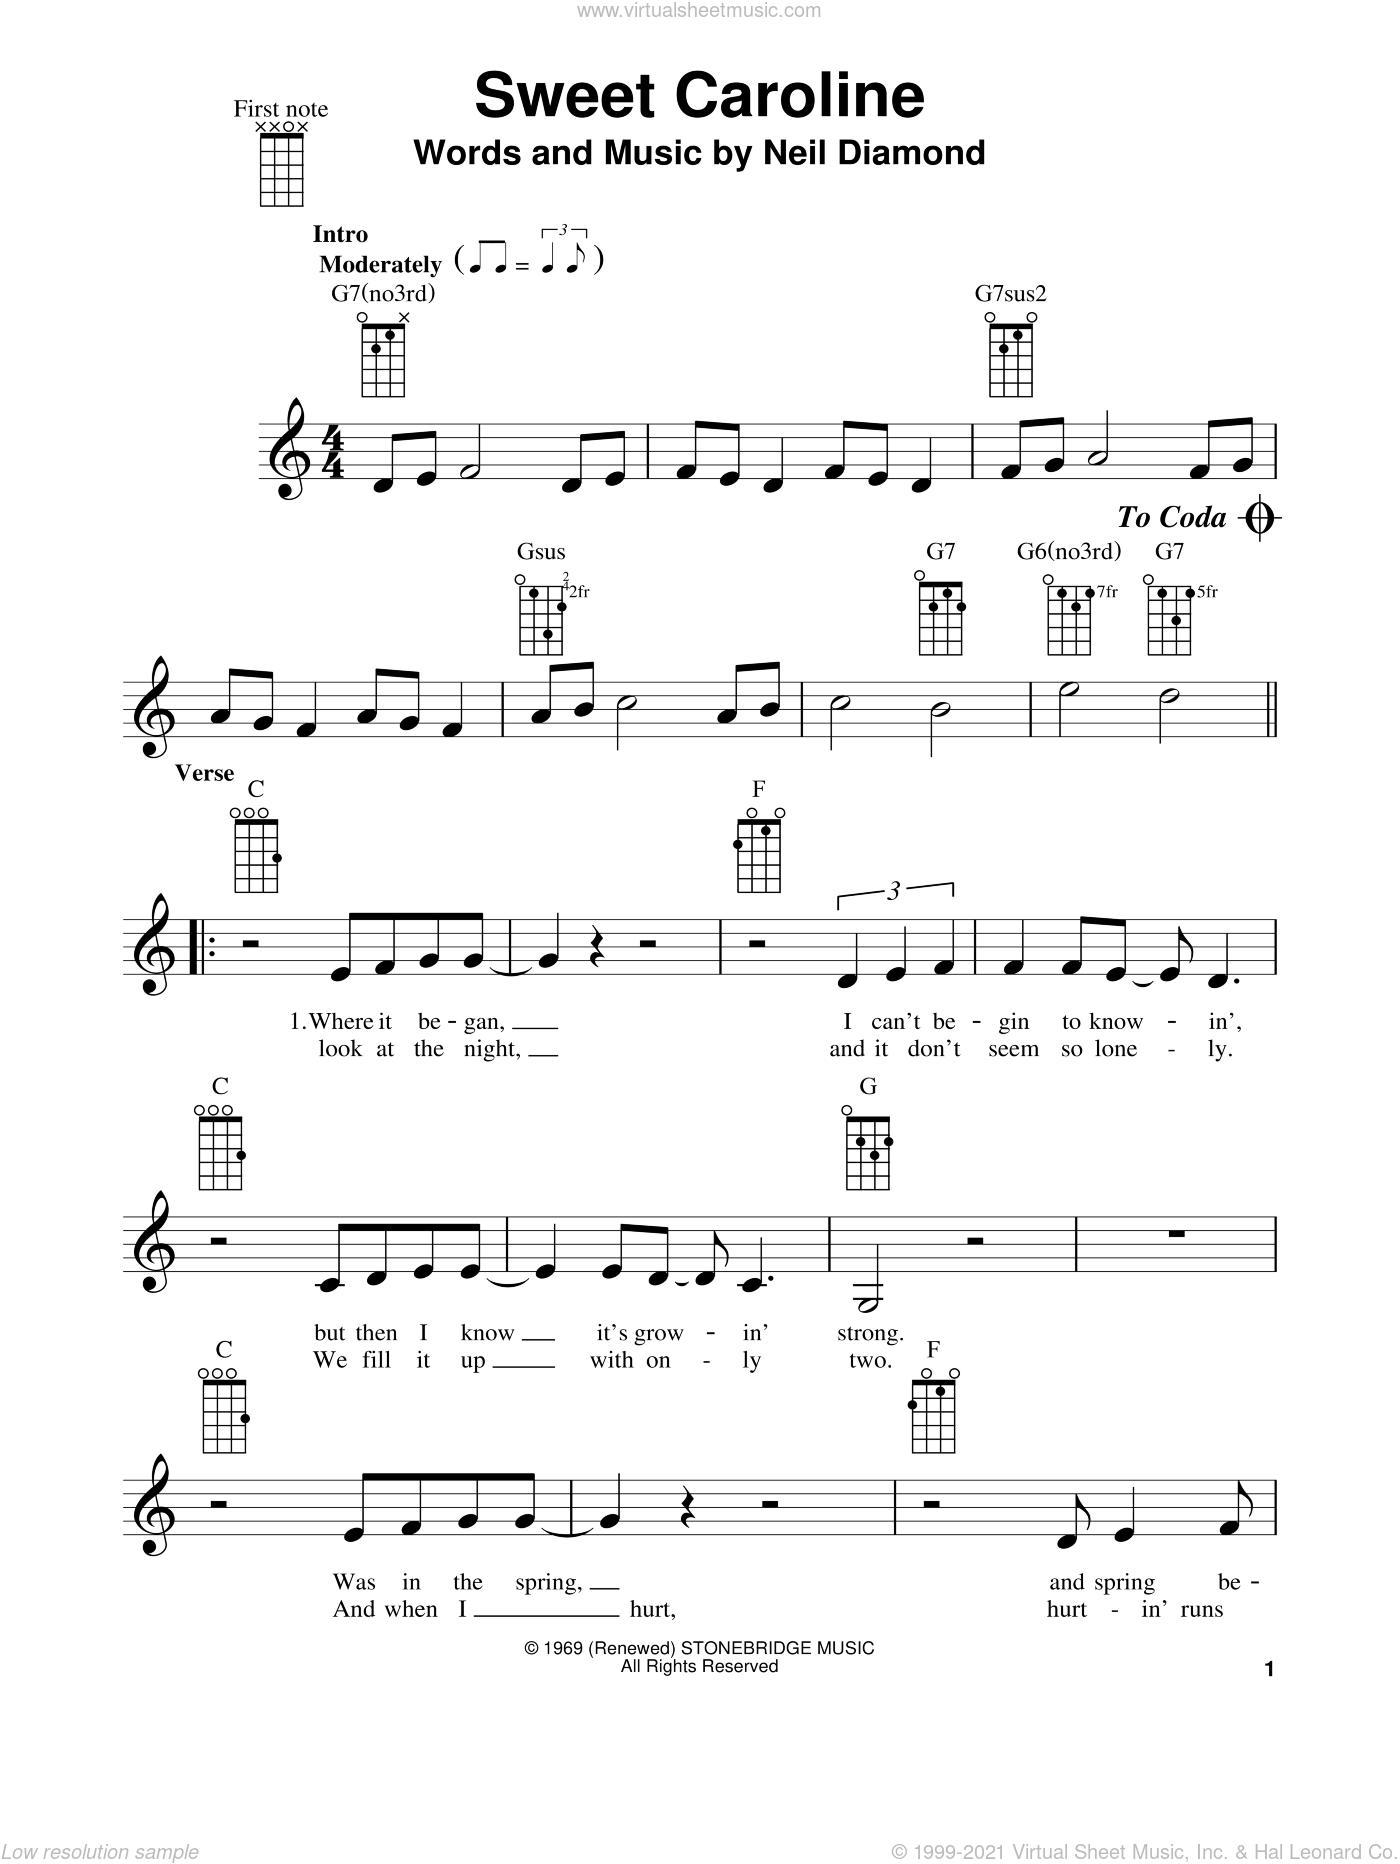 Sweet Caroline sheet music for ukulele by Neil Diamond and Glee Cast, intermediate skill level